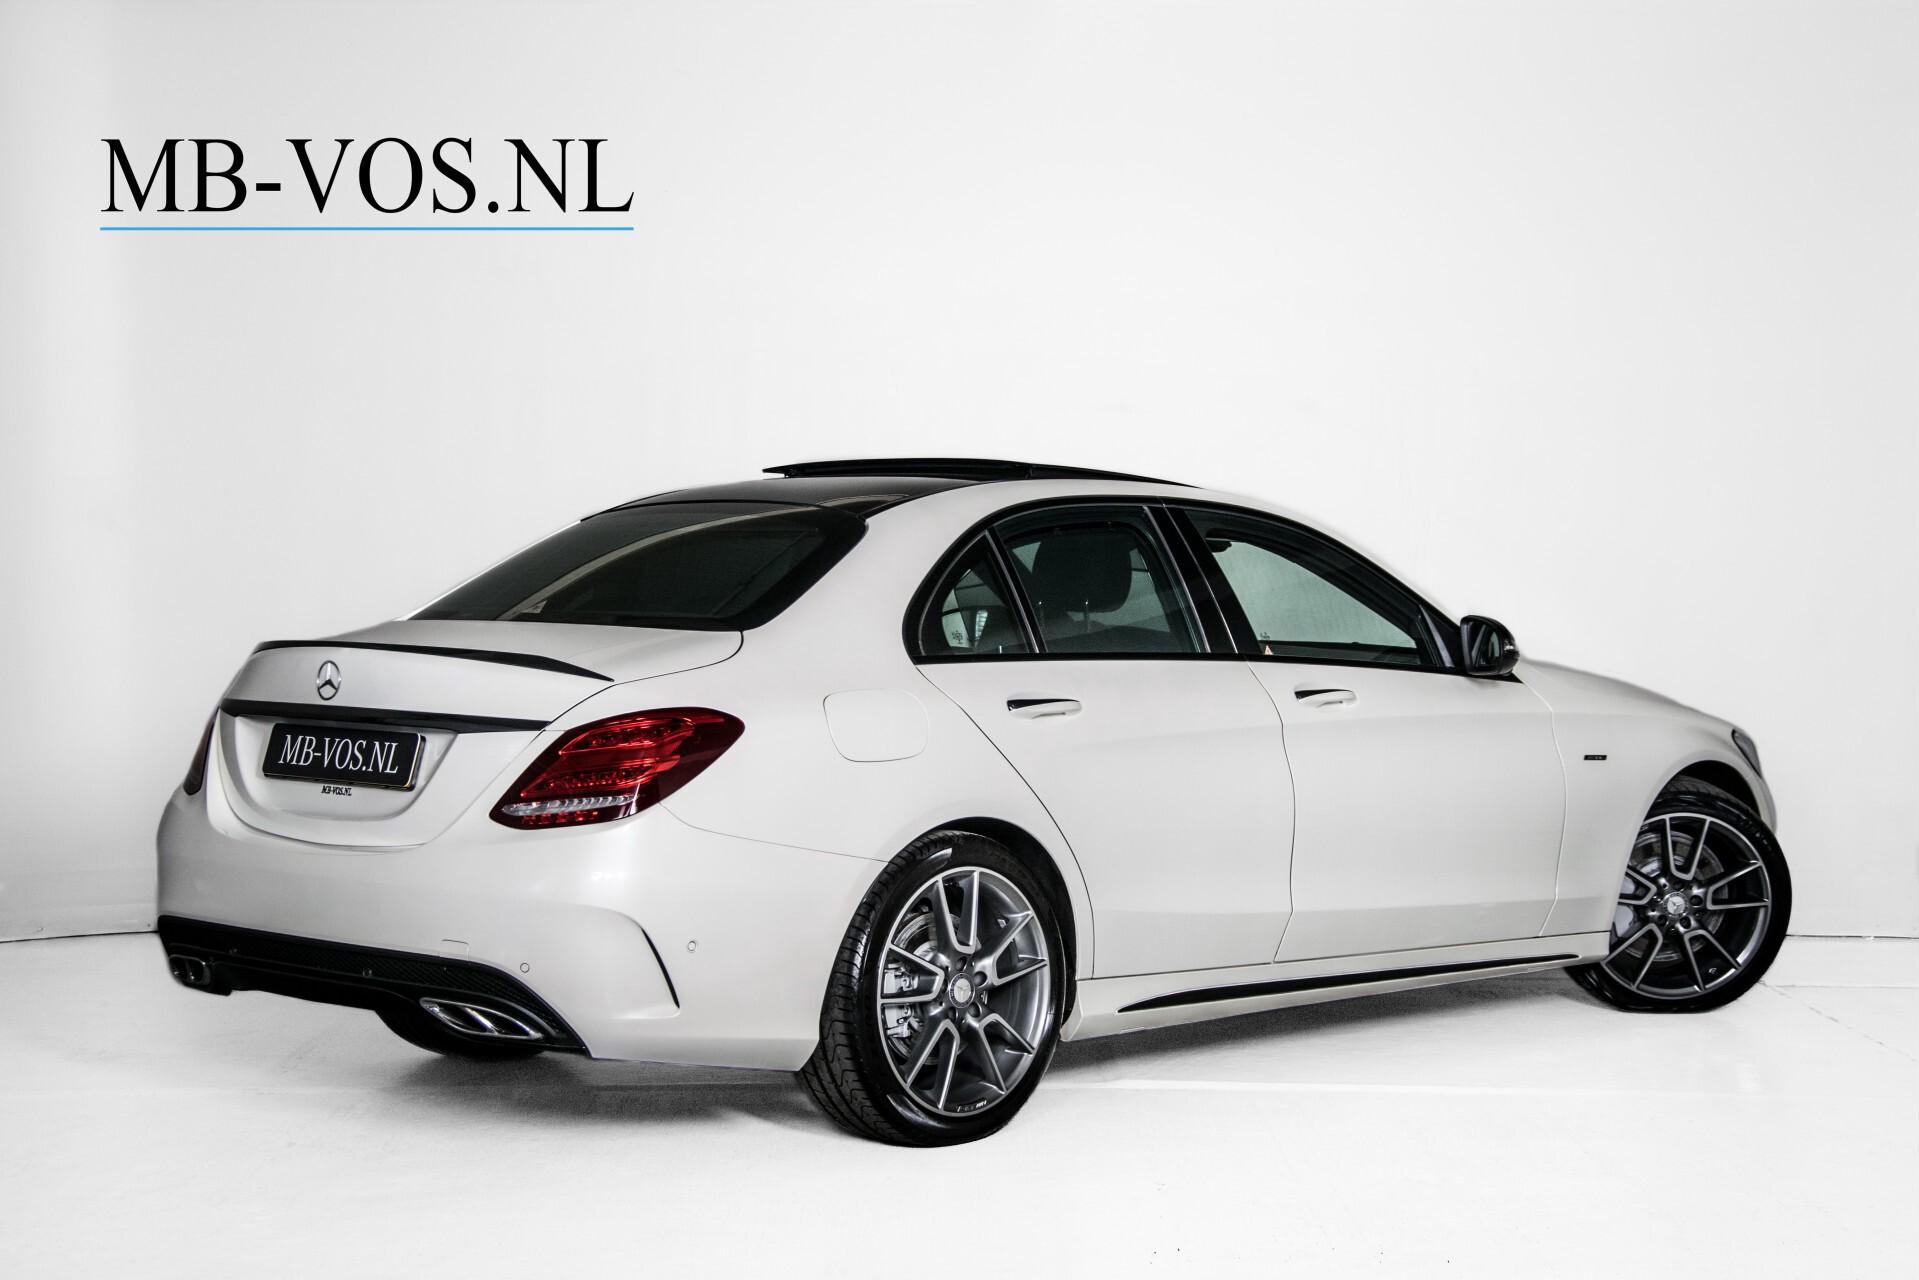 Mercedes-Benz C-Klasse 450/43 AMG 4-M Distronic/Standkachel/Panorama/Keyless/Harman-Kardon/Stoelkoeling Aut7 Foto 2